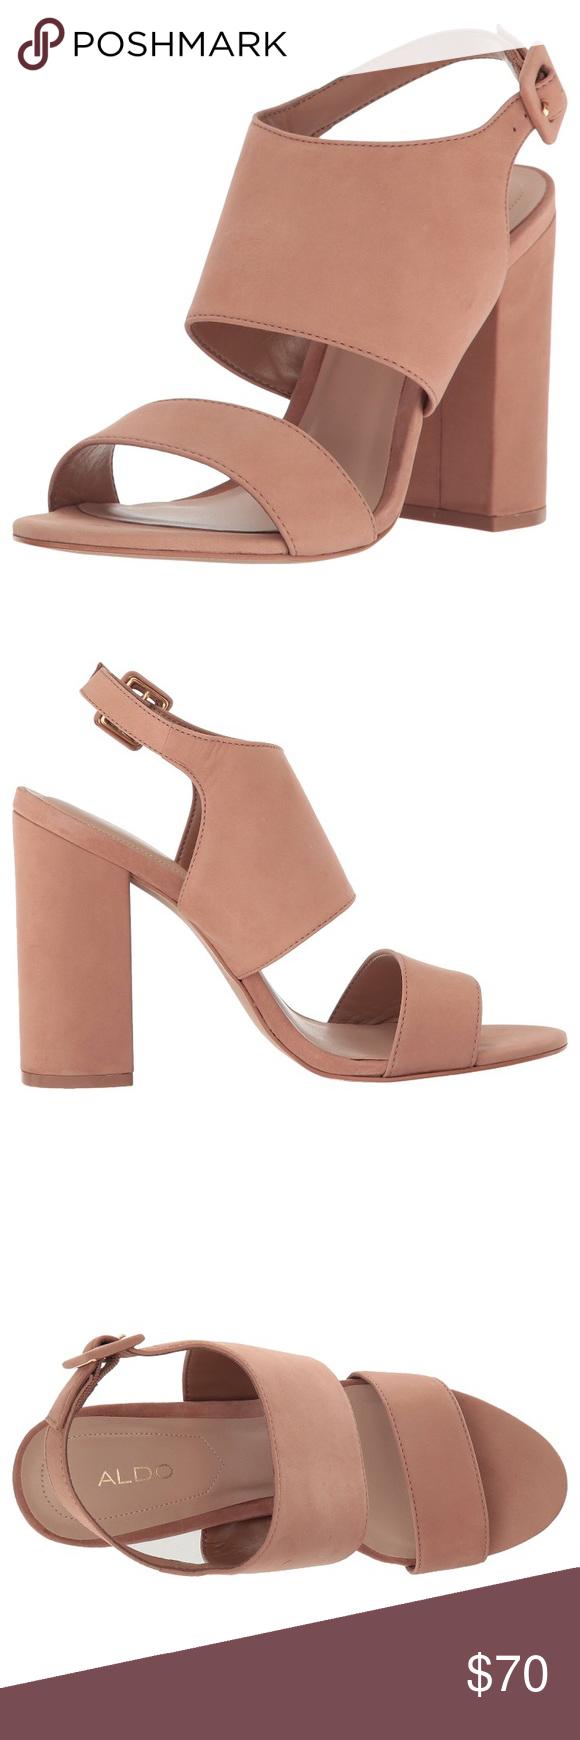 0c9aab9440e Tan block heel sandal size 6 ALDO Size 6 ALDO Elise sandal. Worn once!